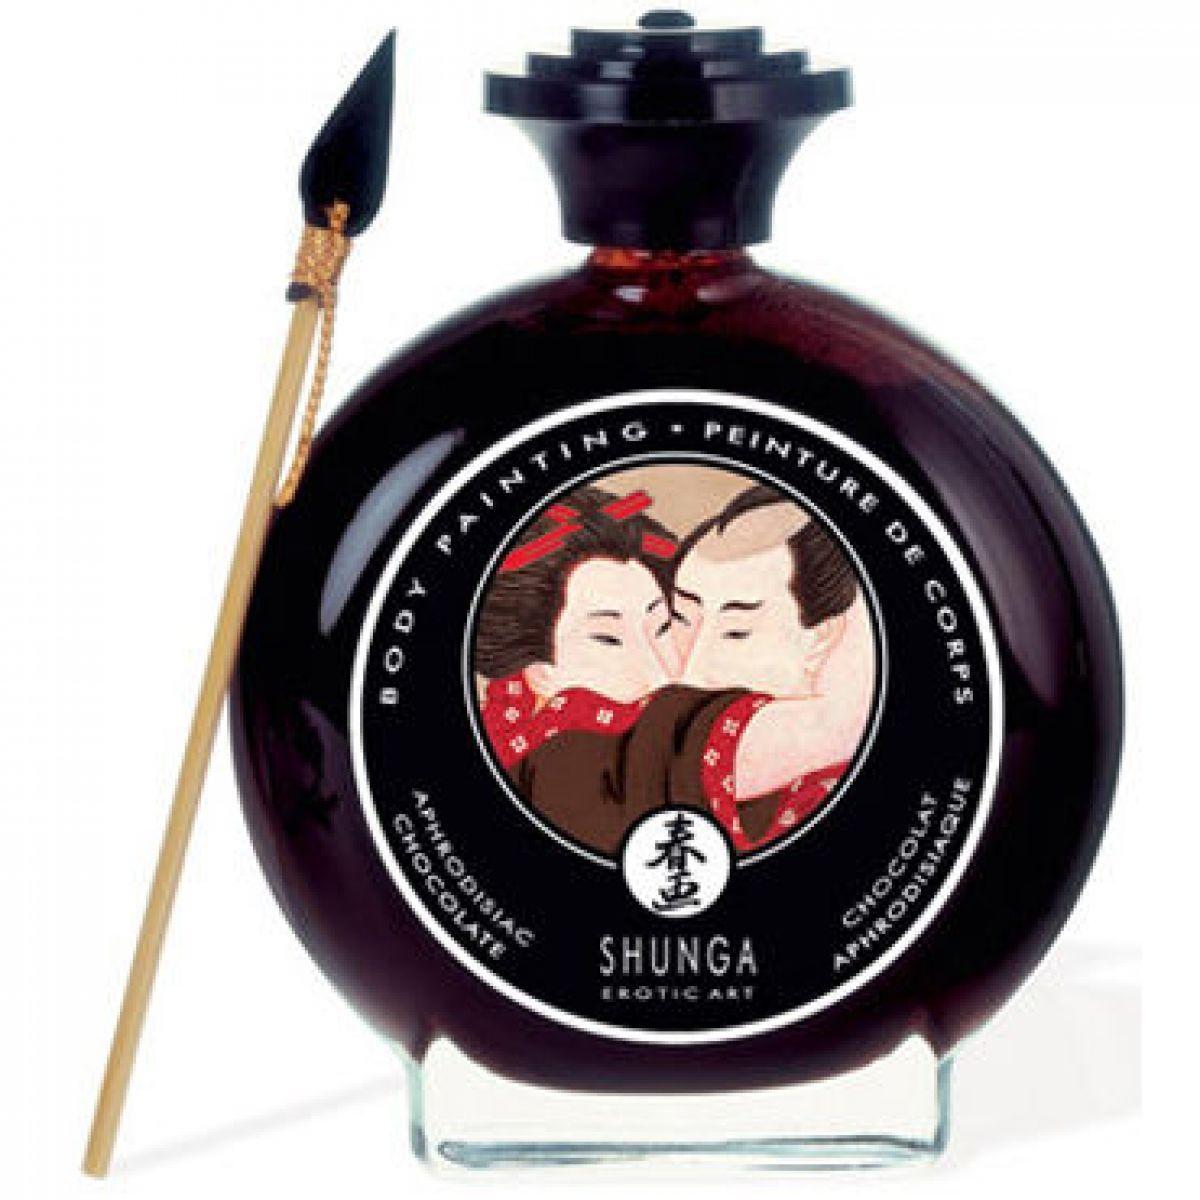 Крем-краска для тела Shunga Эротический шоколад, 100 мл